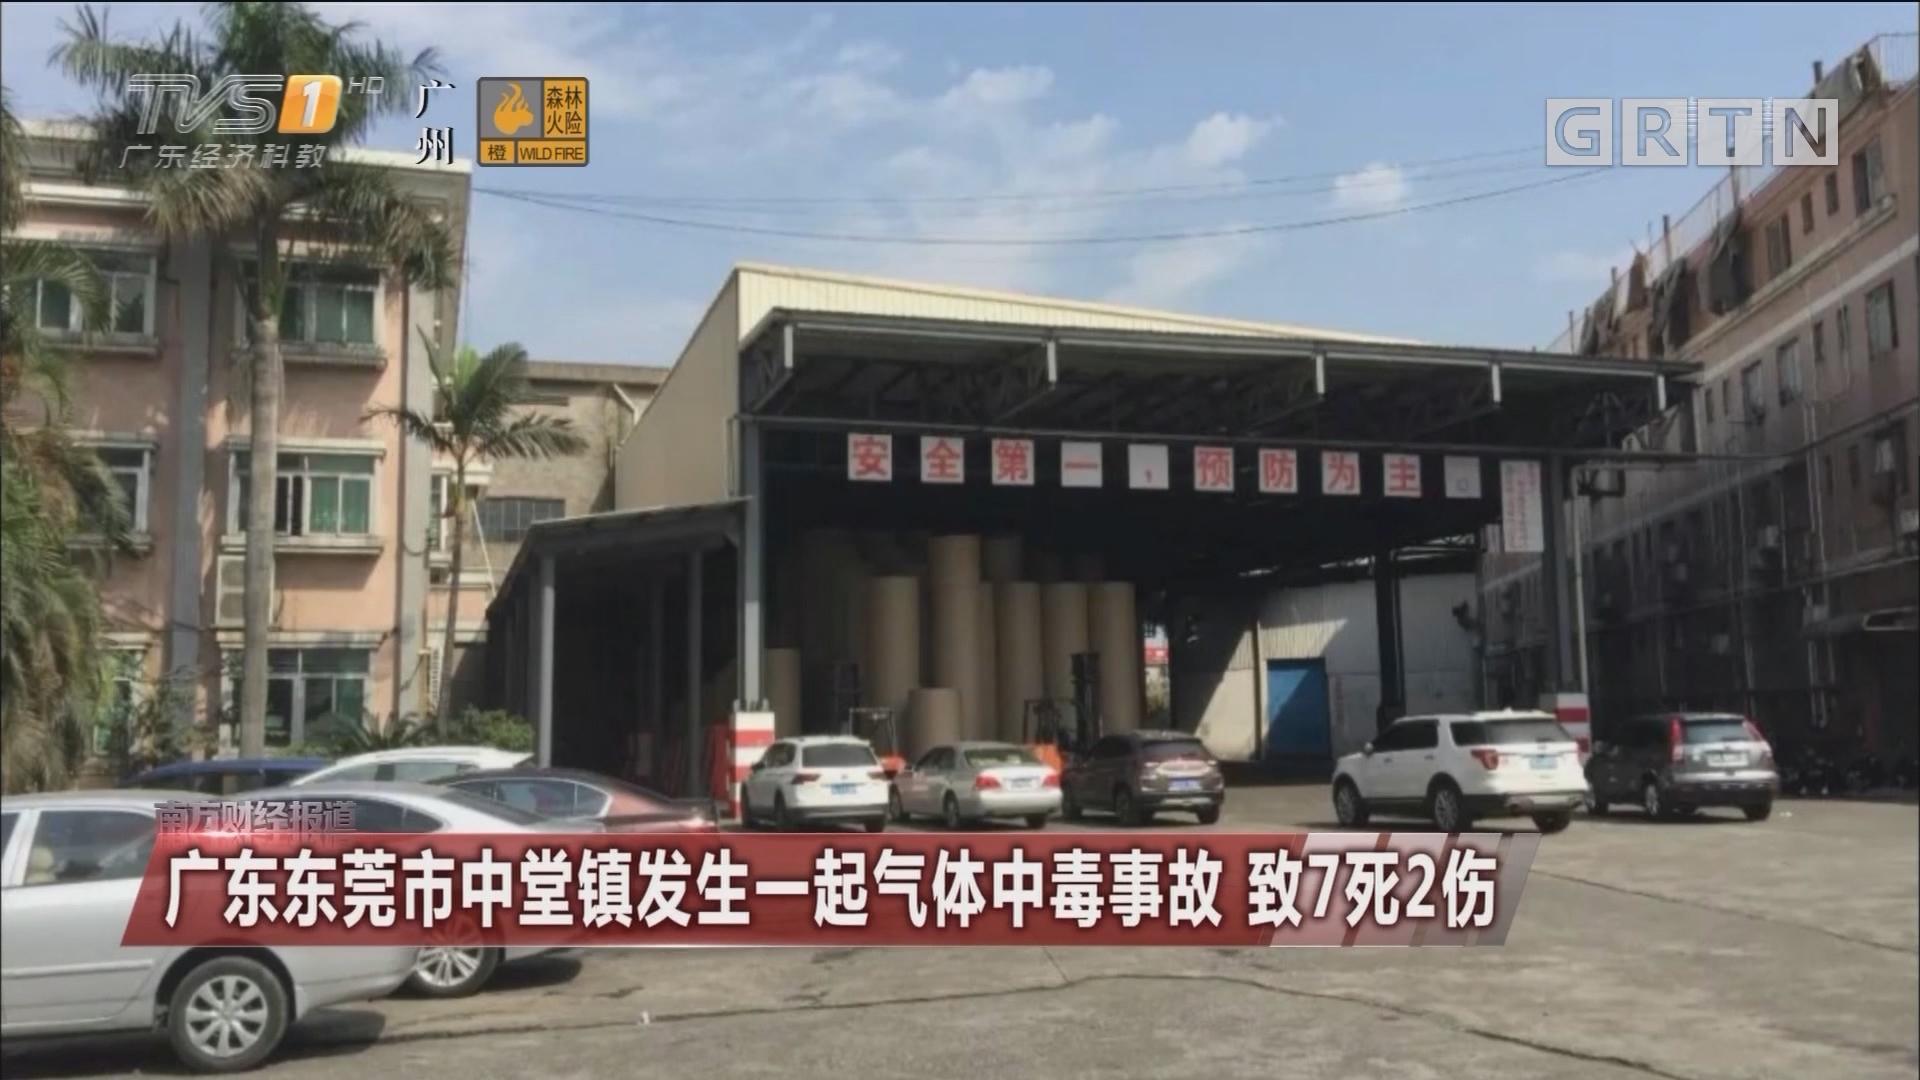 manbetx手机版 - 登陆东莞市中堂镇发生一起气体中毒事故 致7死2伤